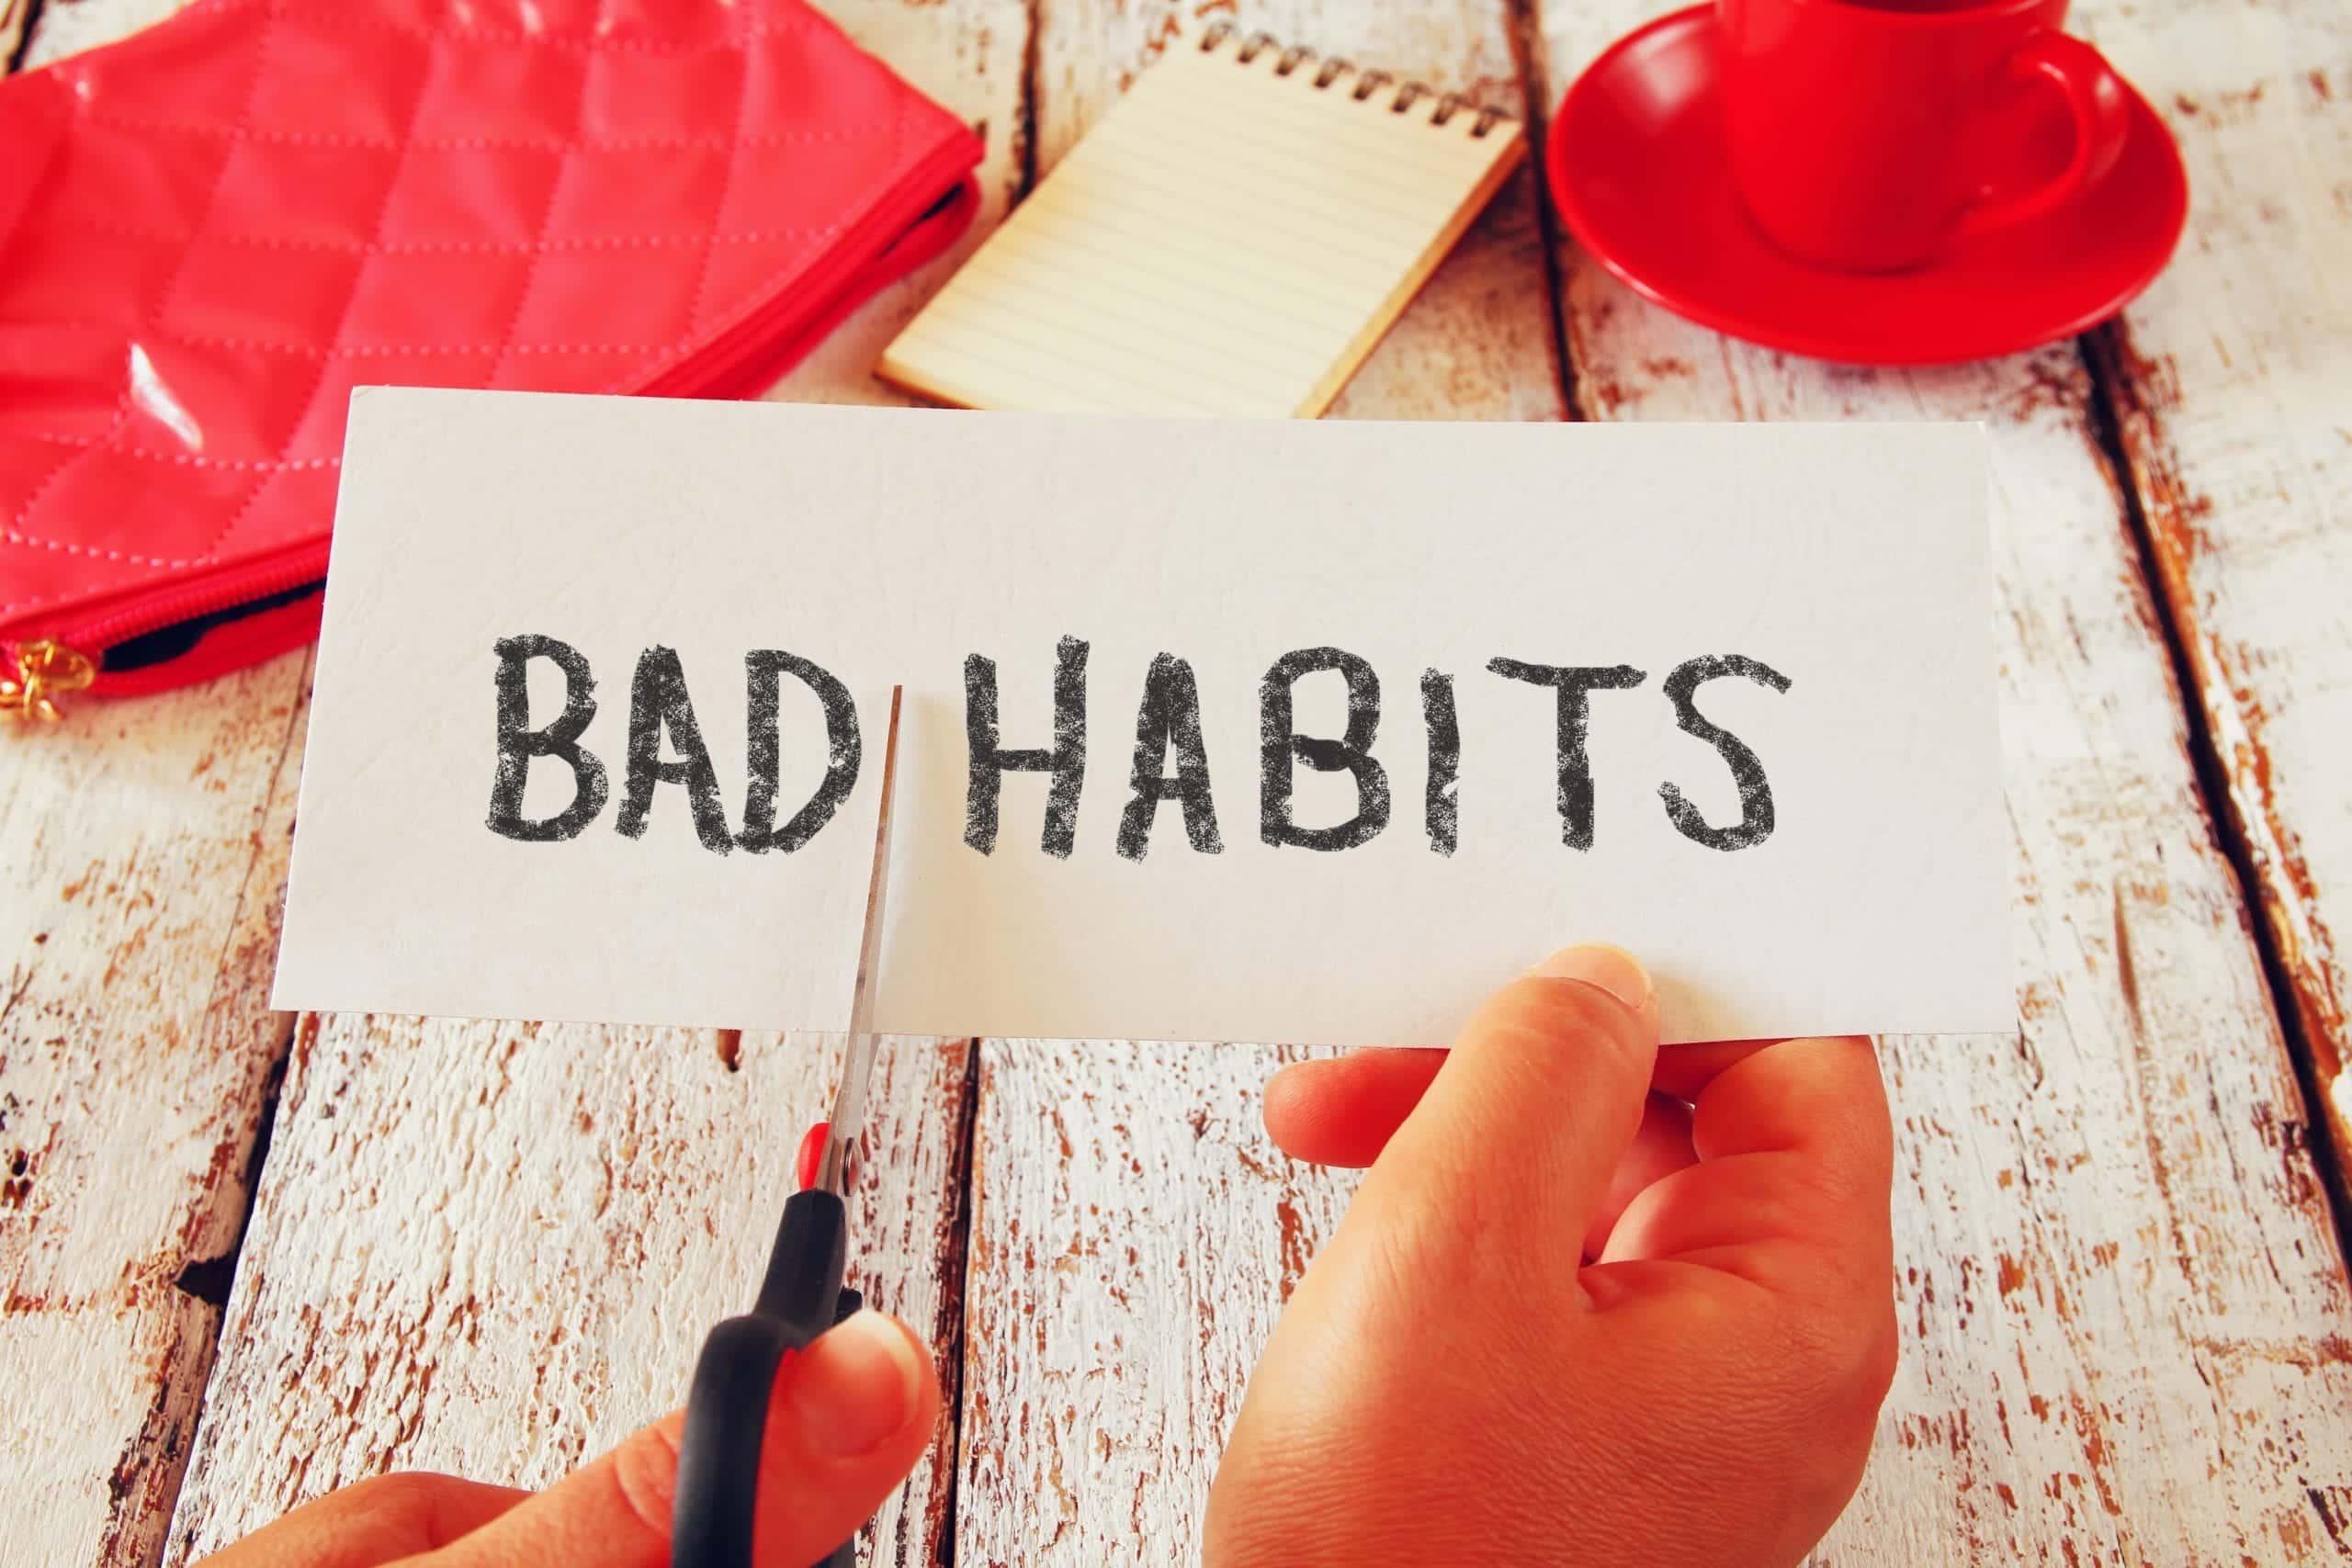 Why are Bad Habits so hard to break?